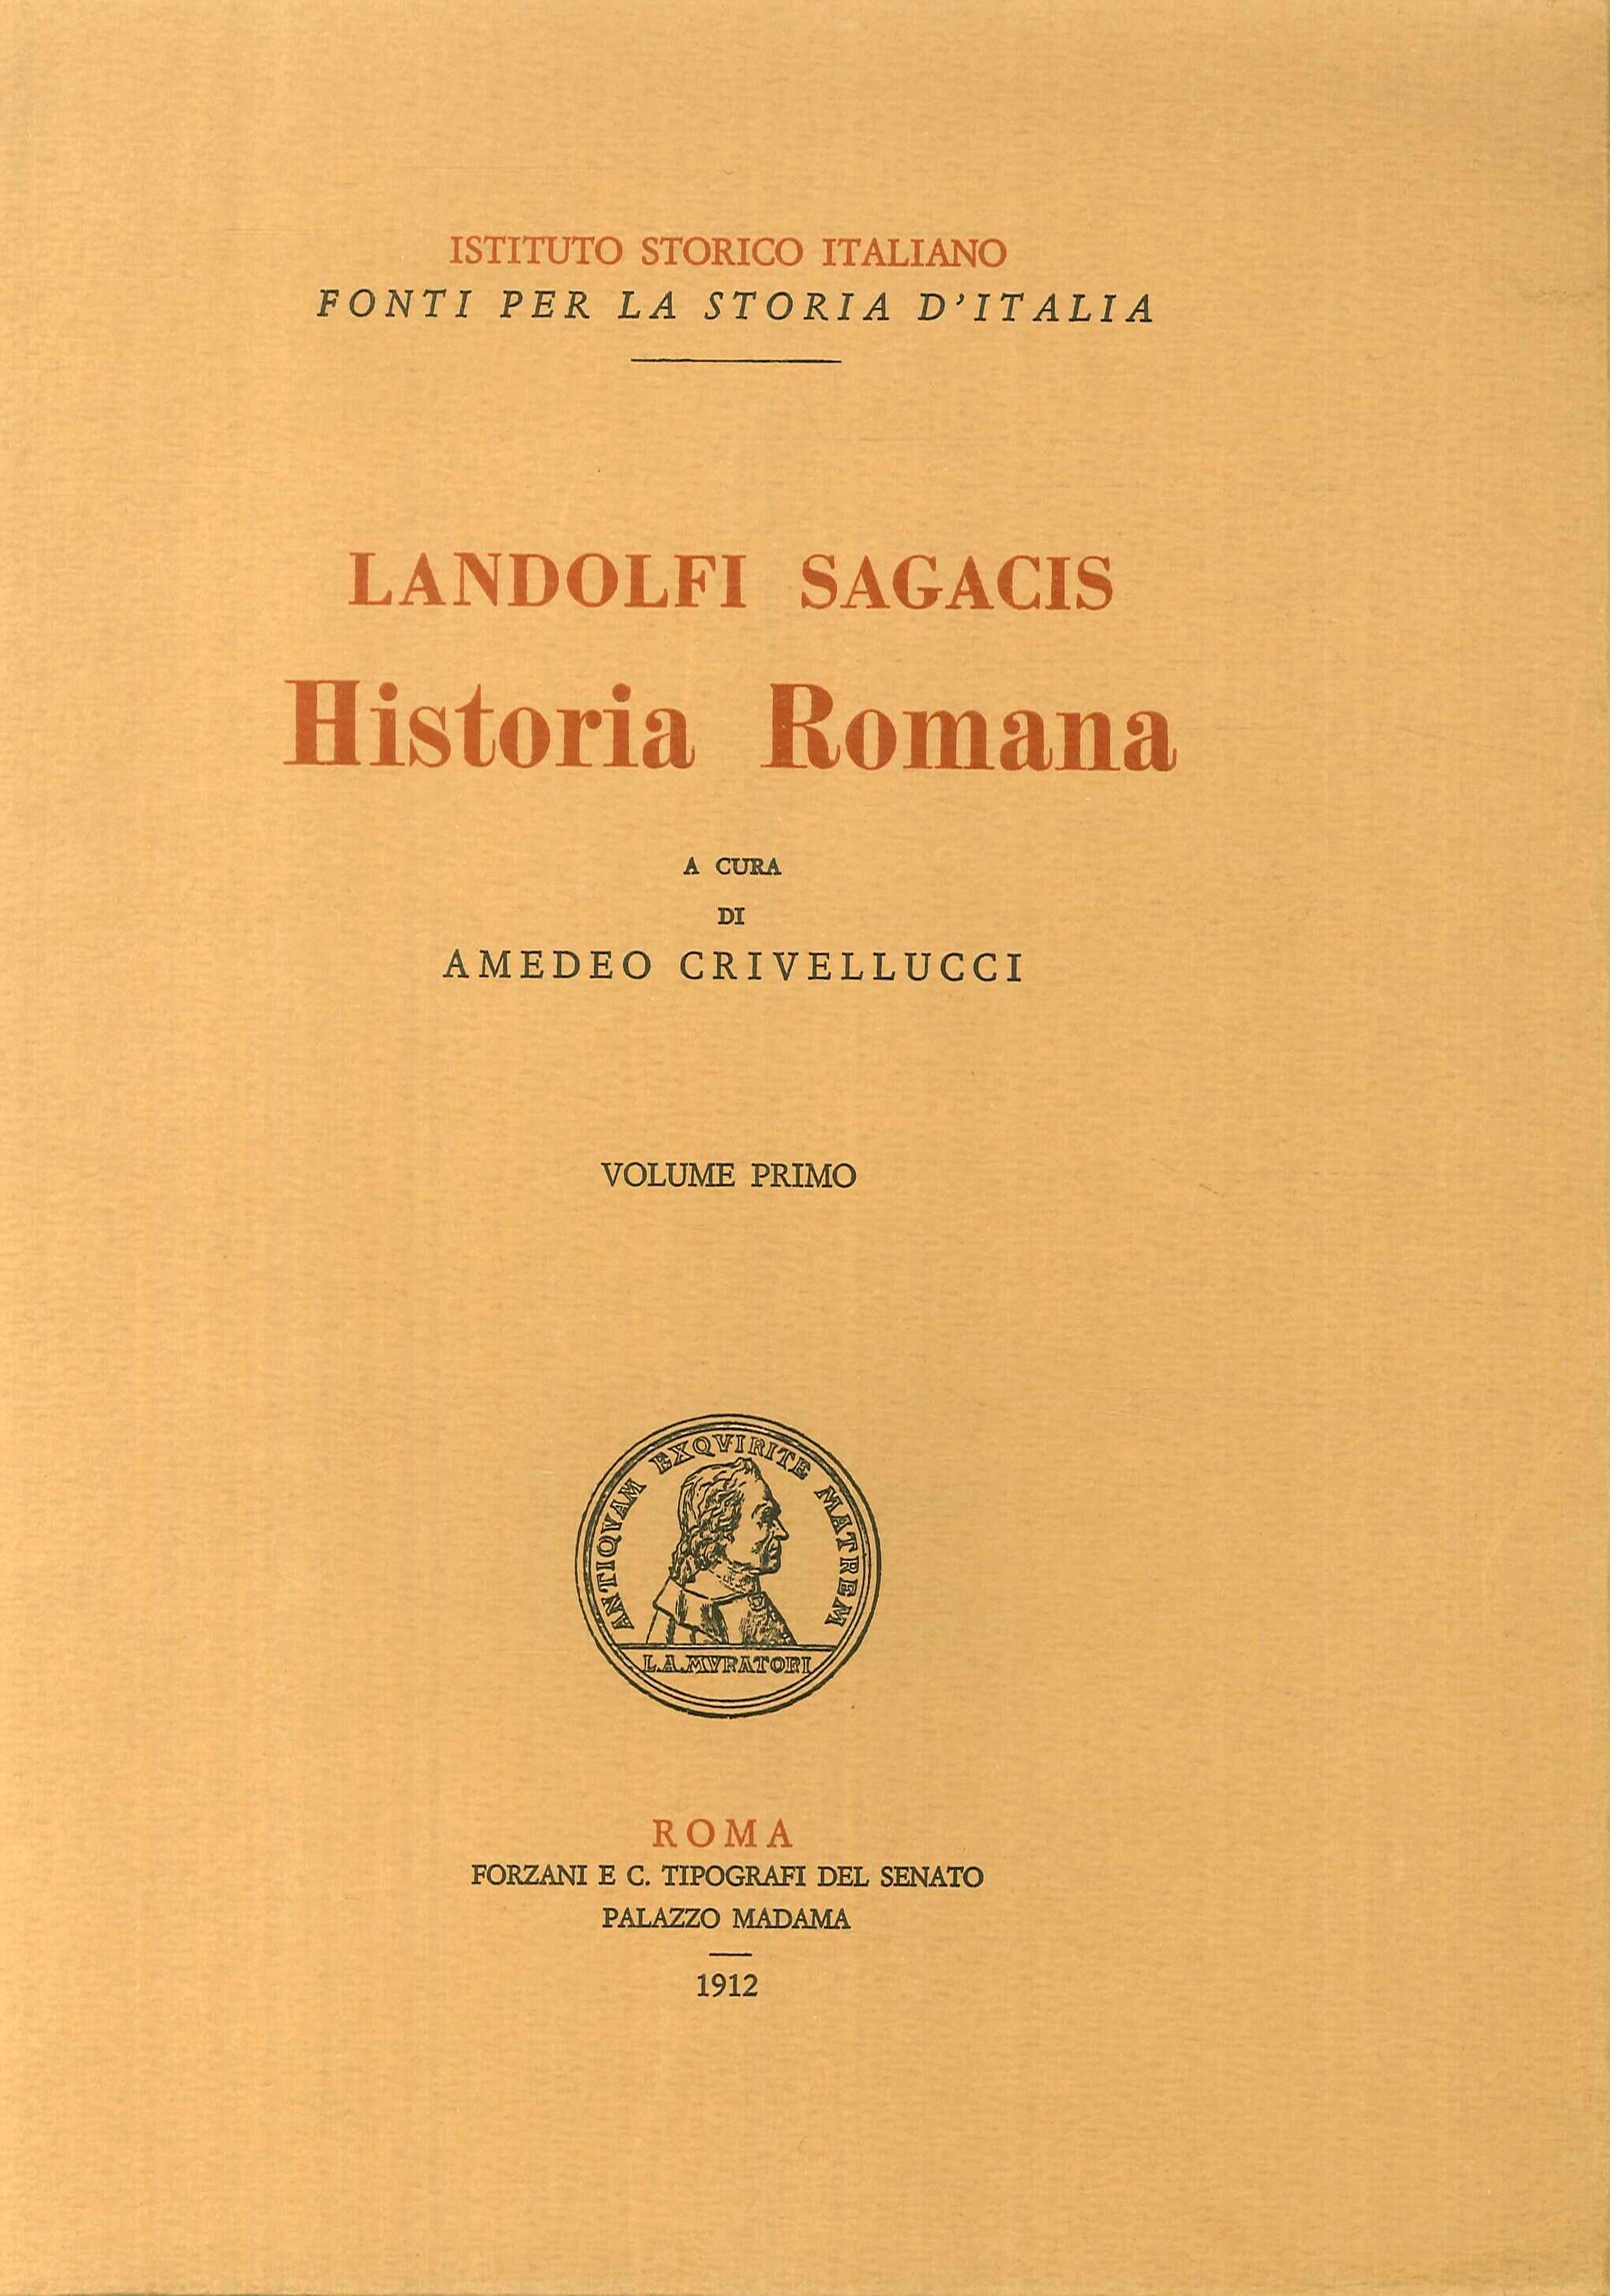 Landolfi Sagacis. Historia Romana. Volume Primo